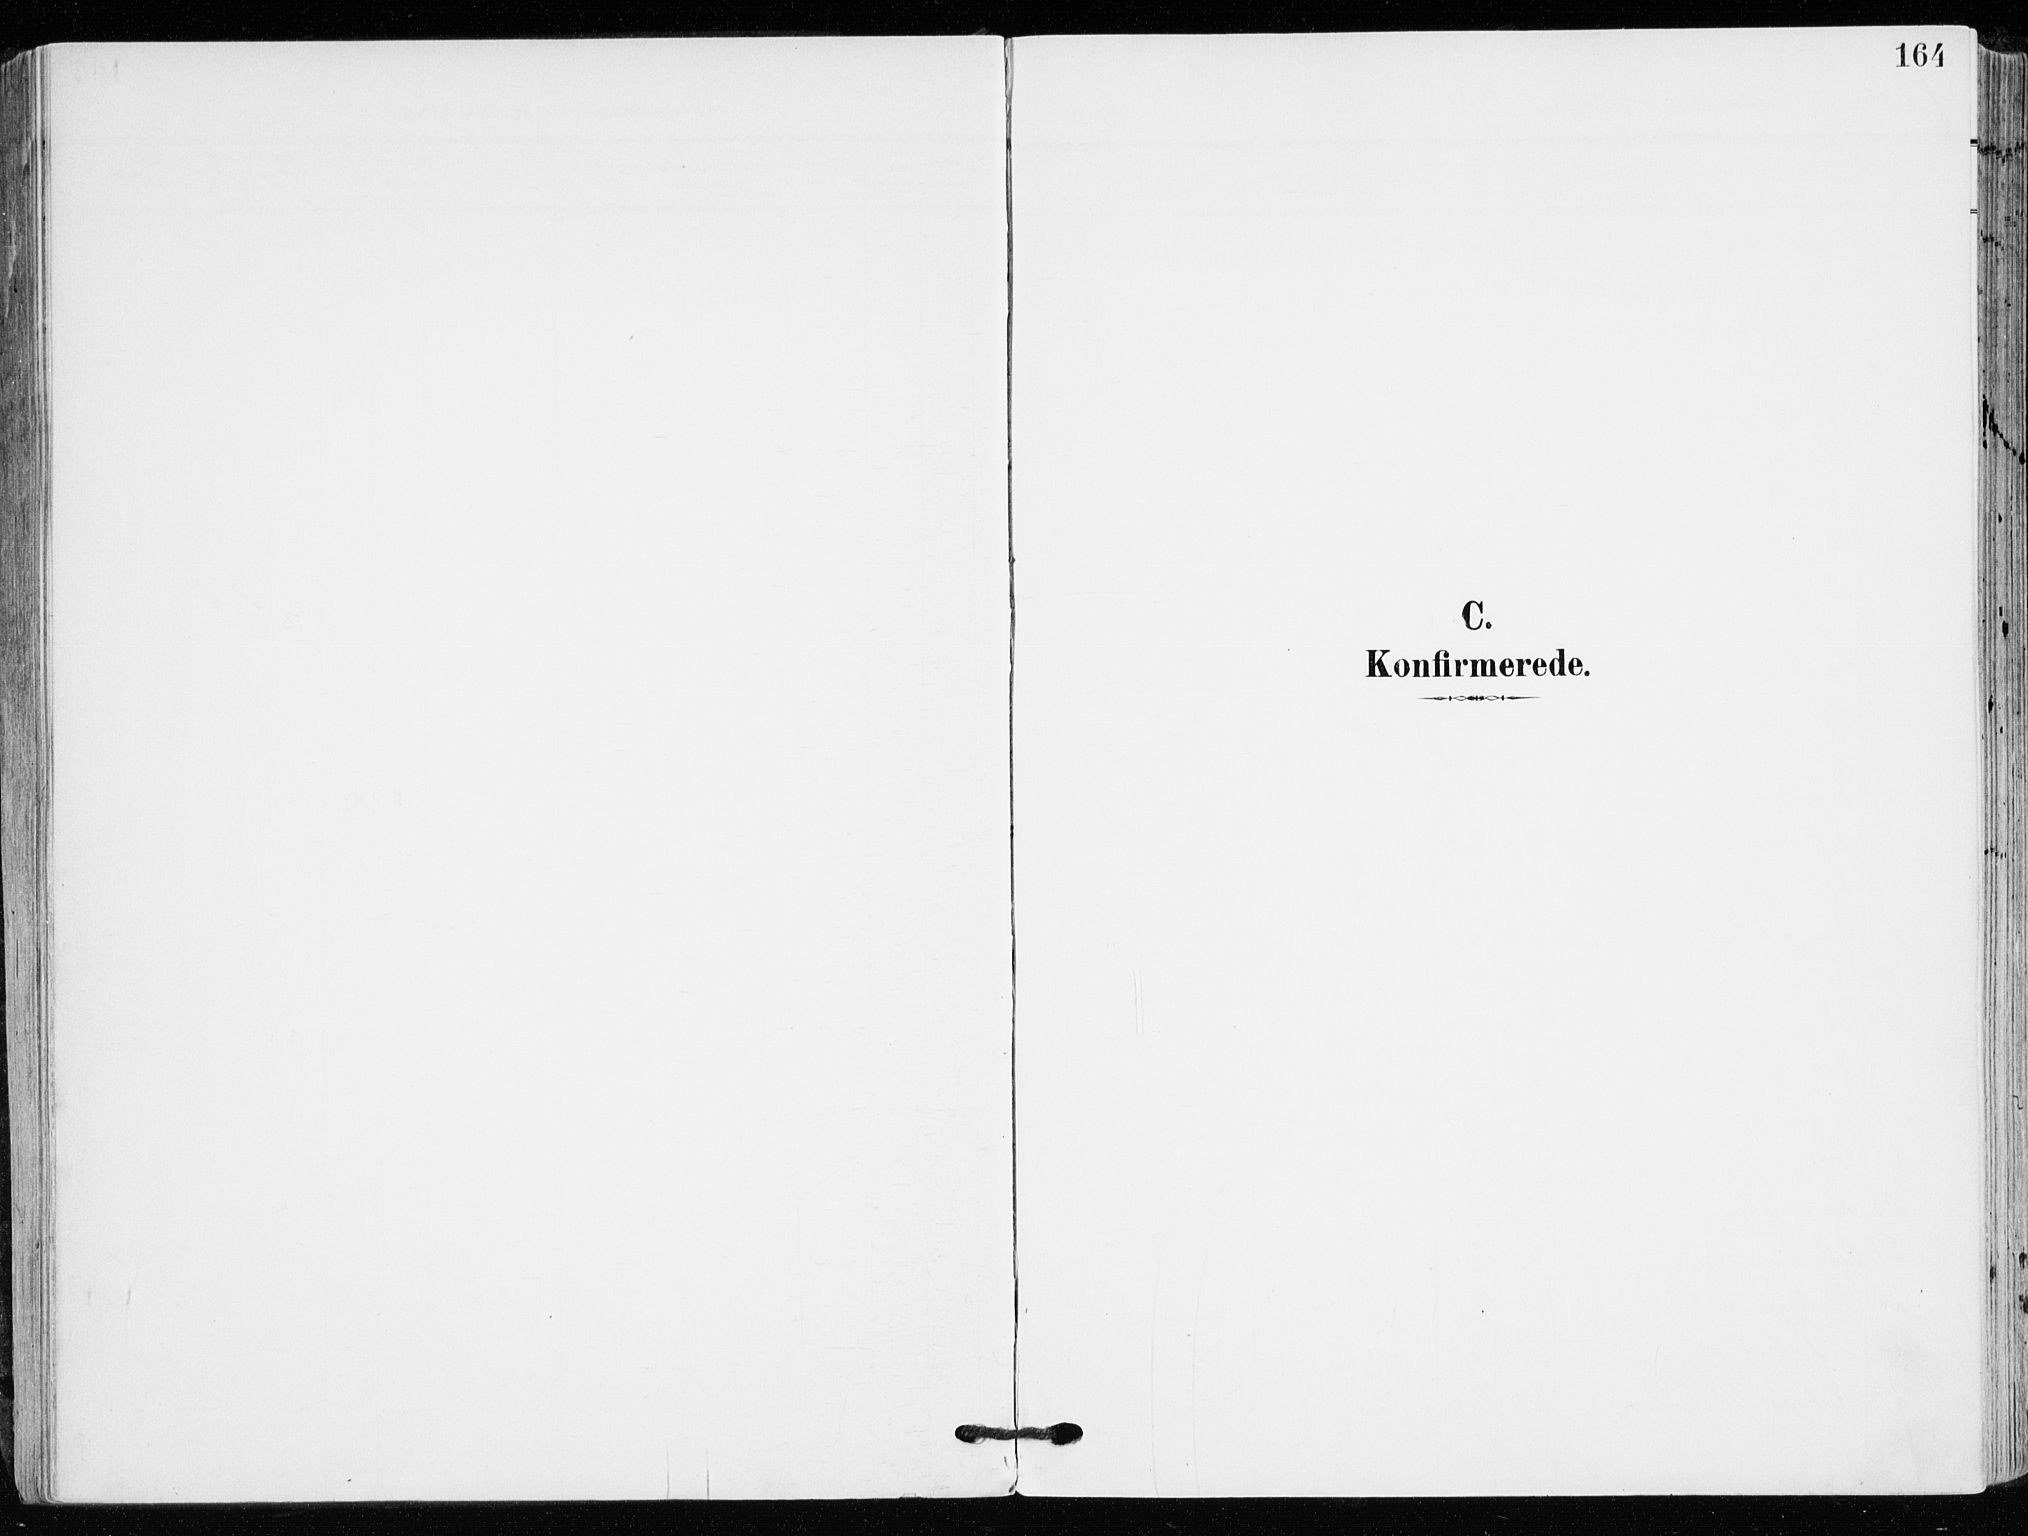 SAKO, Kongsberg kirkebøker, F/Fb/L0004: Ministerialbok nr. II 4, 1906-1918, s. 164